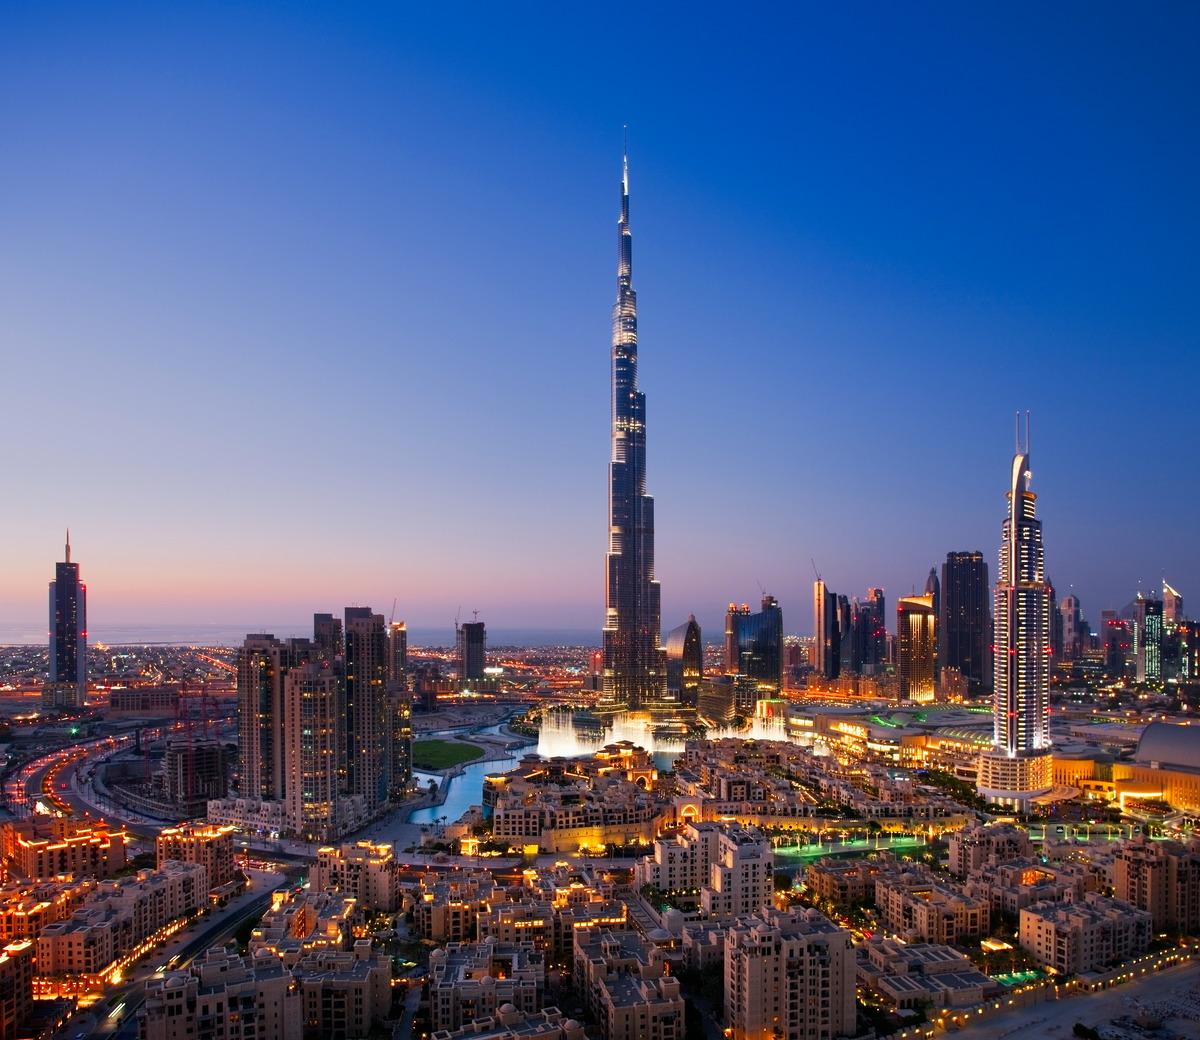 Dubais Stadtzentrum mit Burj Khalifa und Dubai Fountain